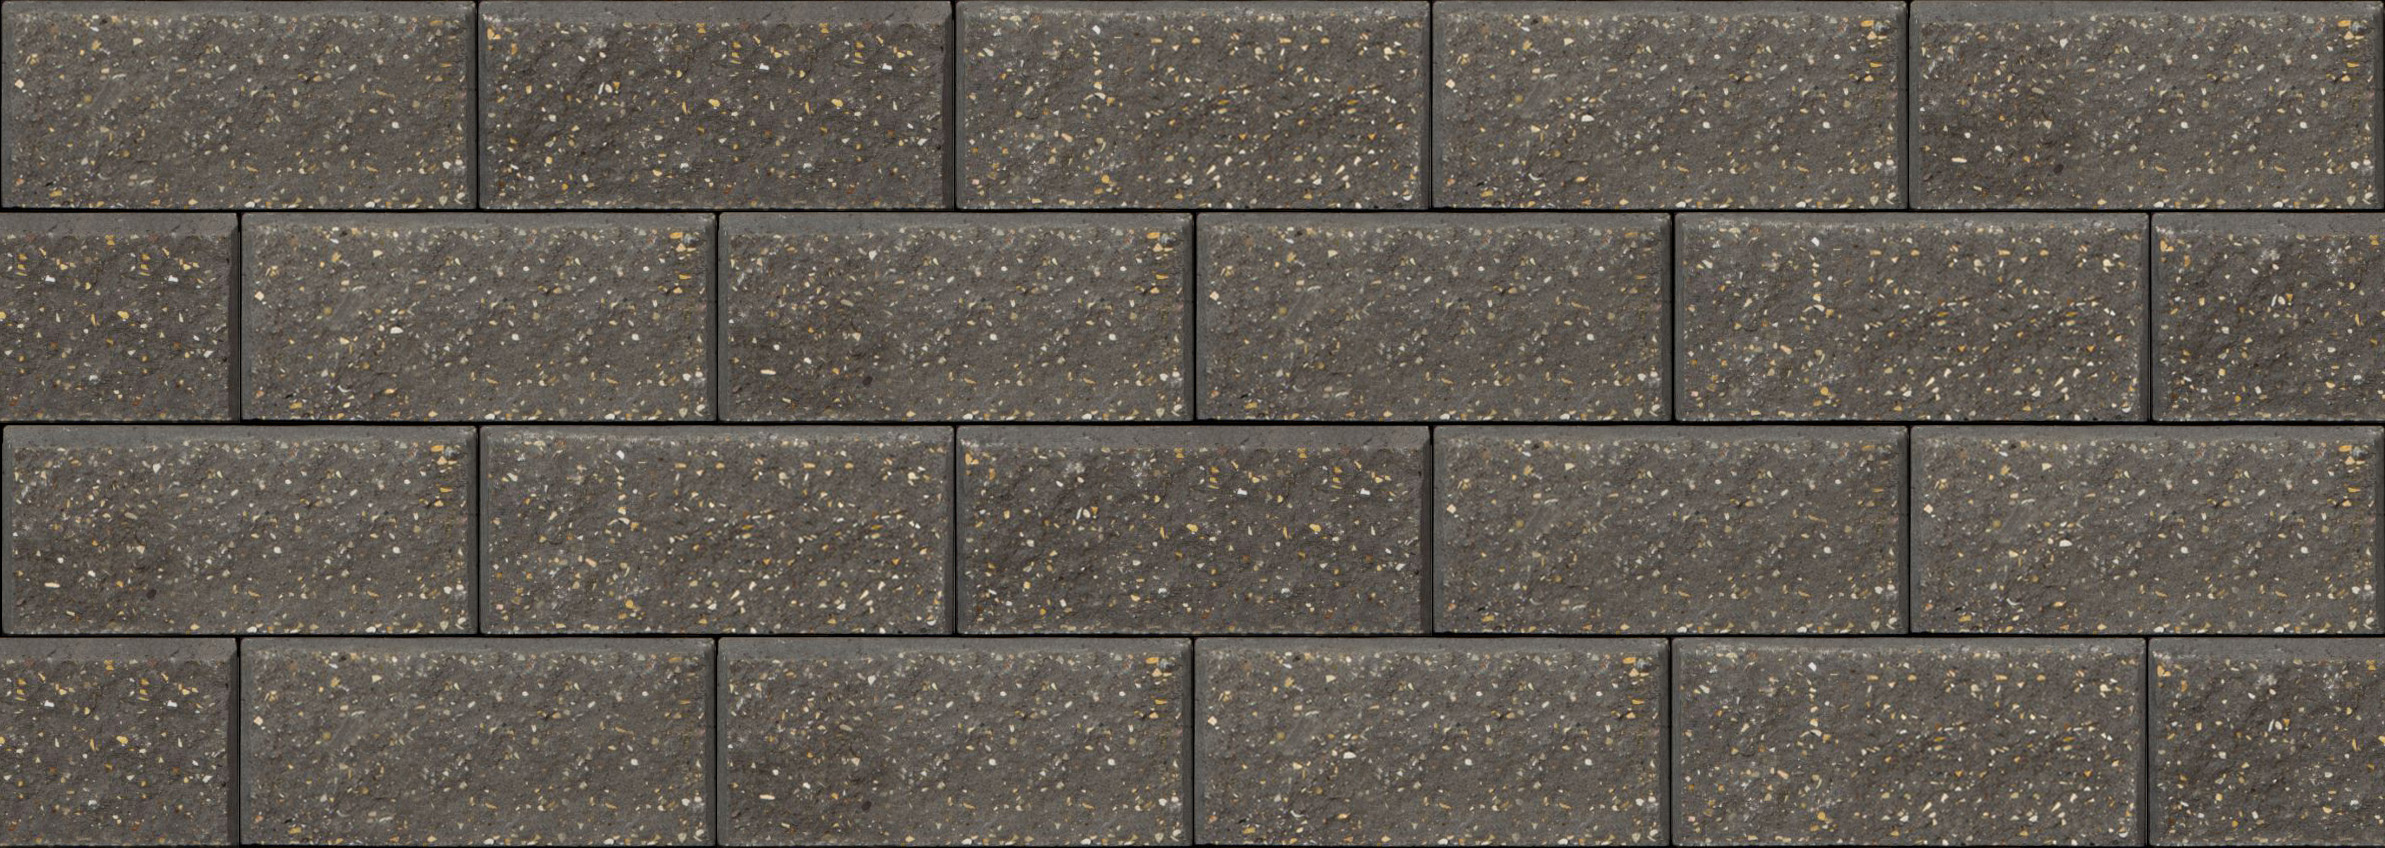 textures stone bim